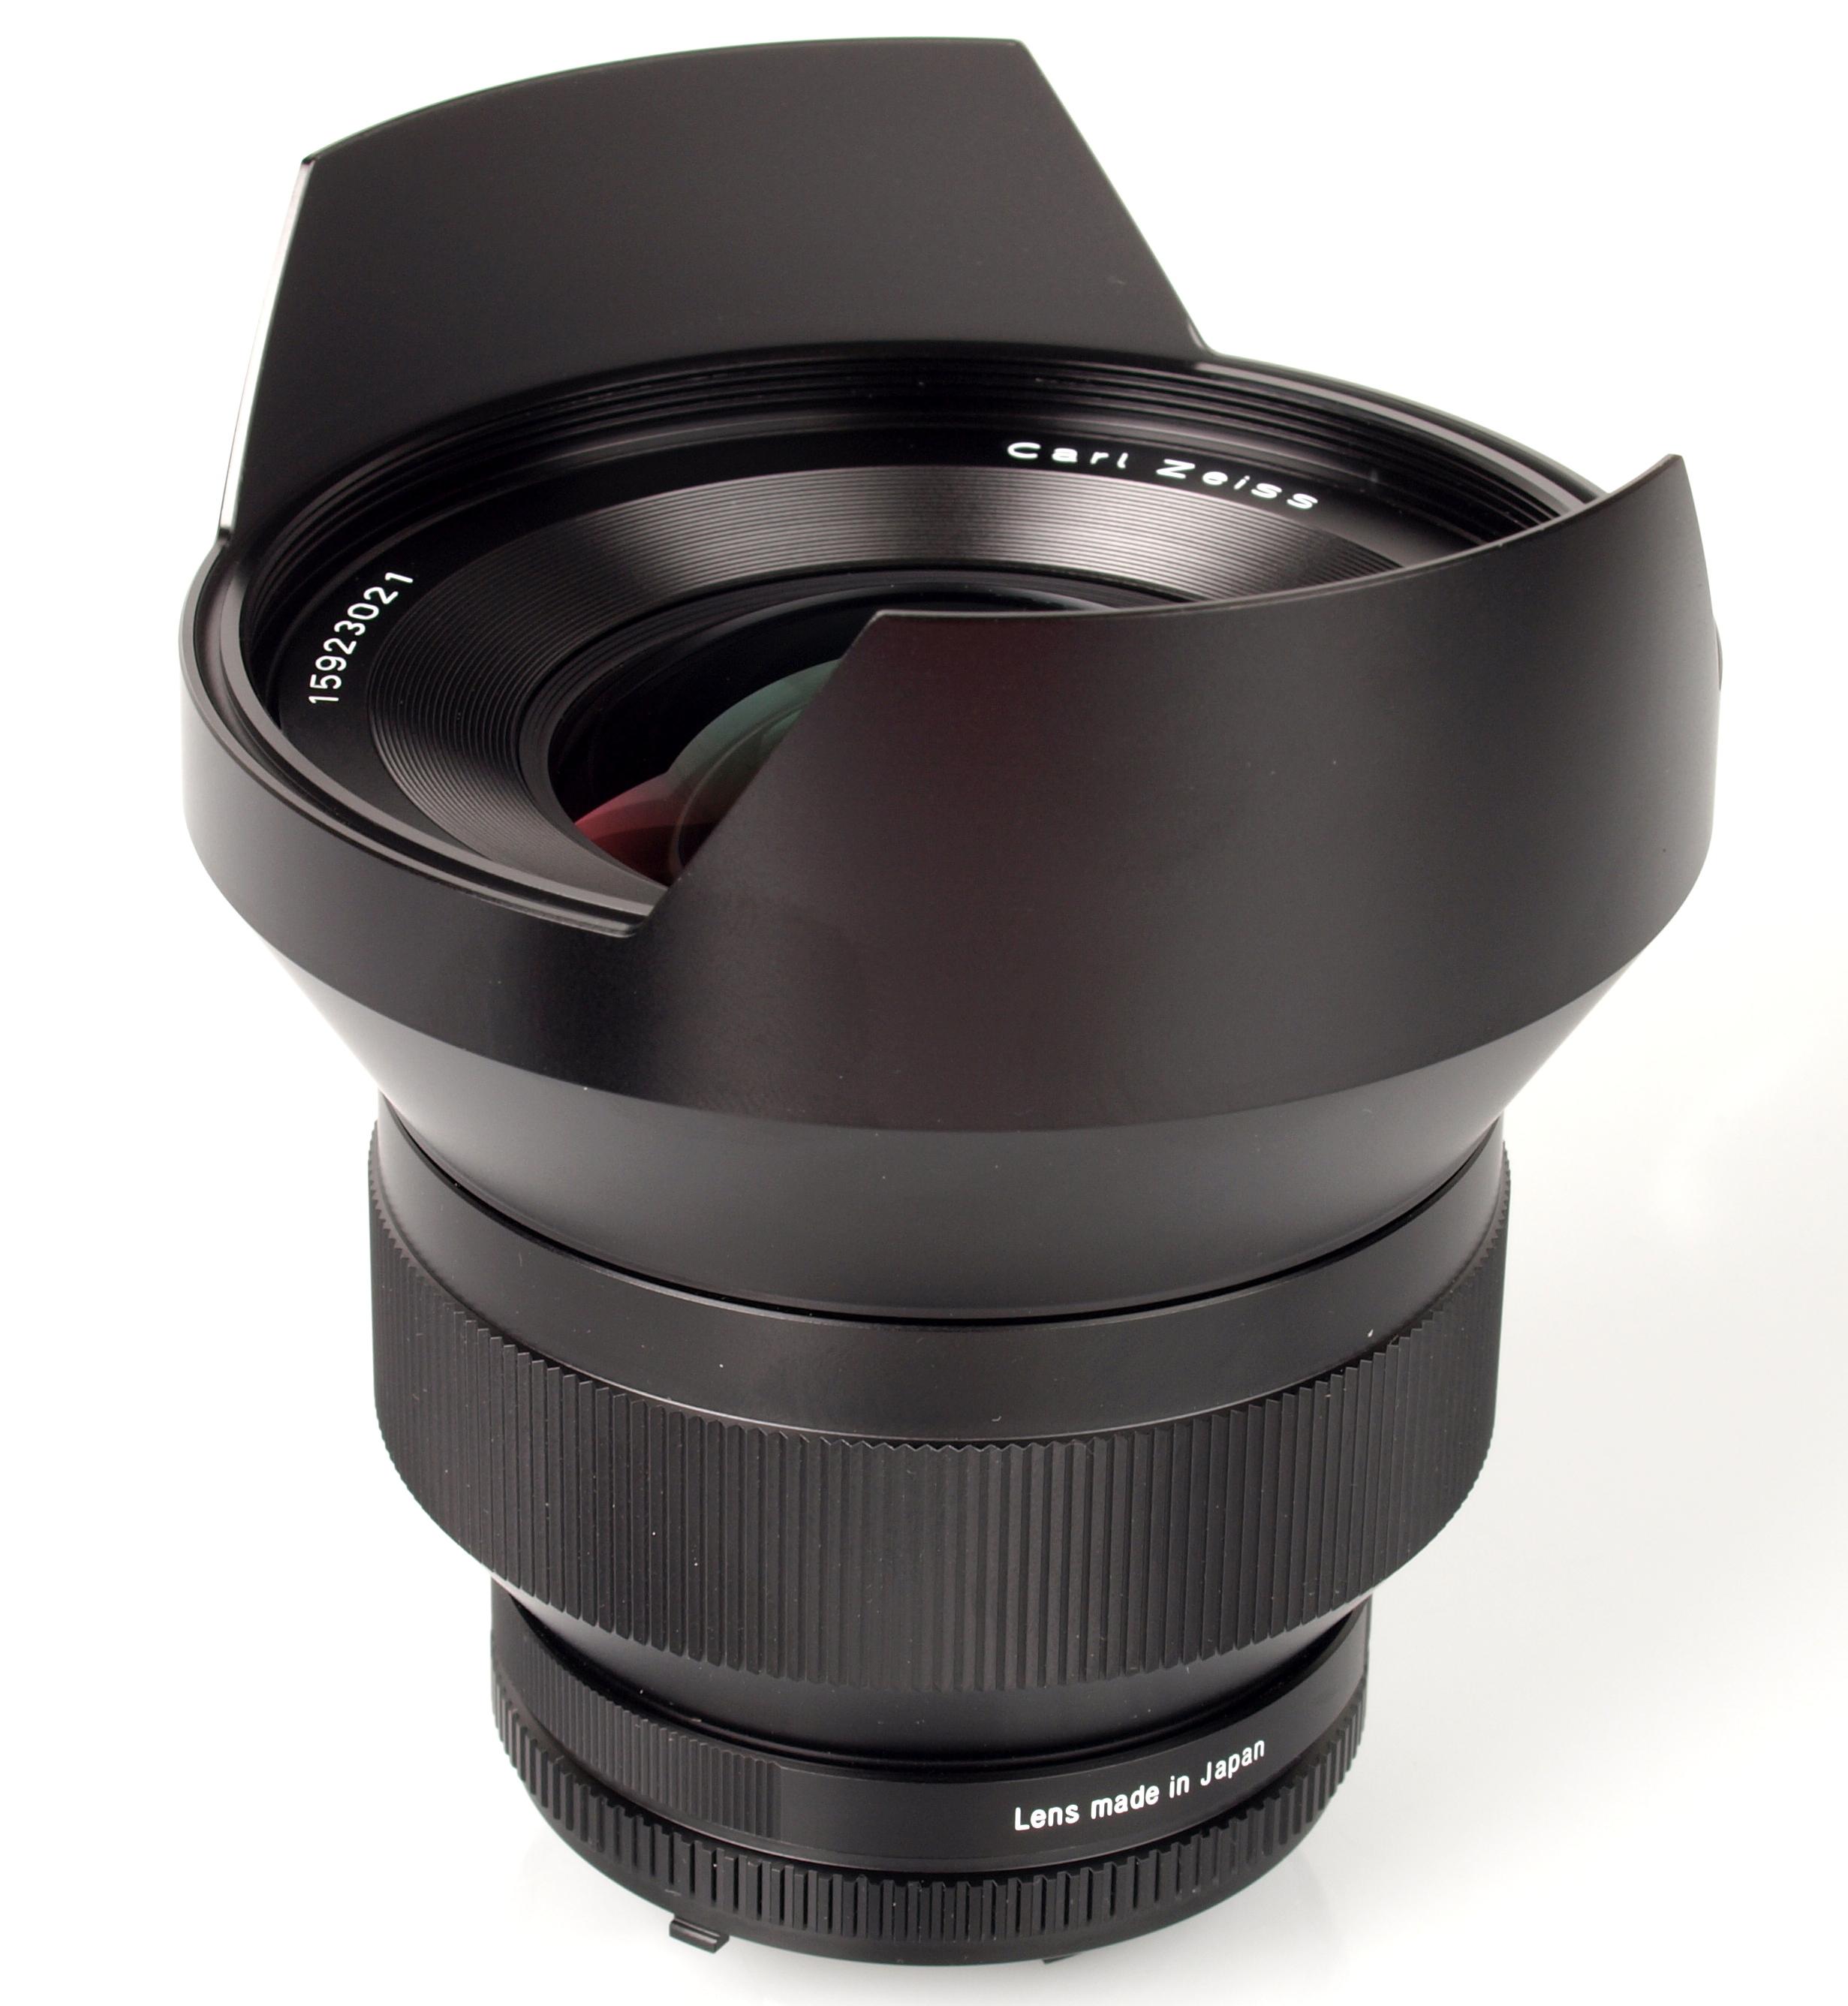 Zeiss Otus 15mm f/2.8 ZM Lens Black Leica M | Park Cameras